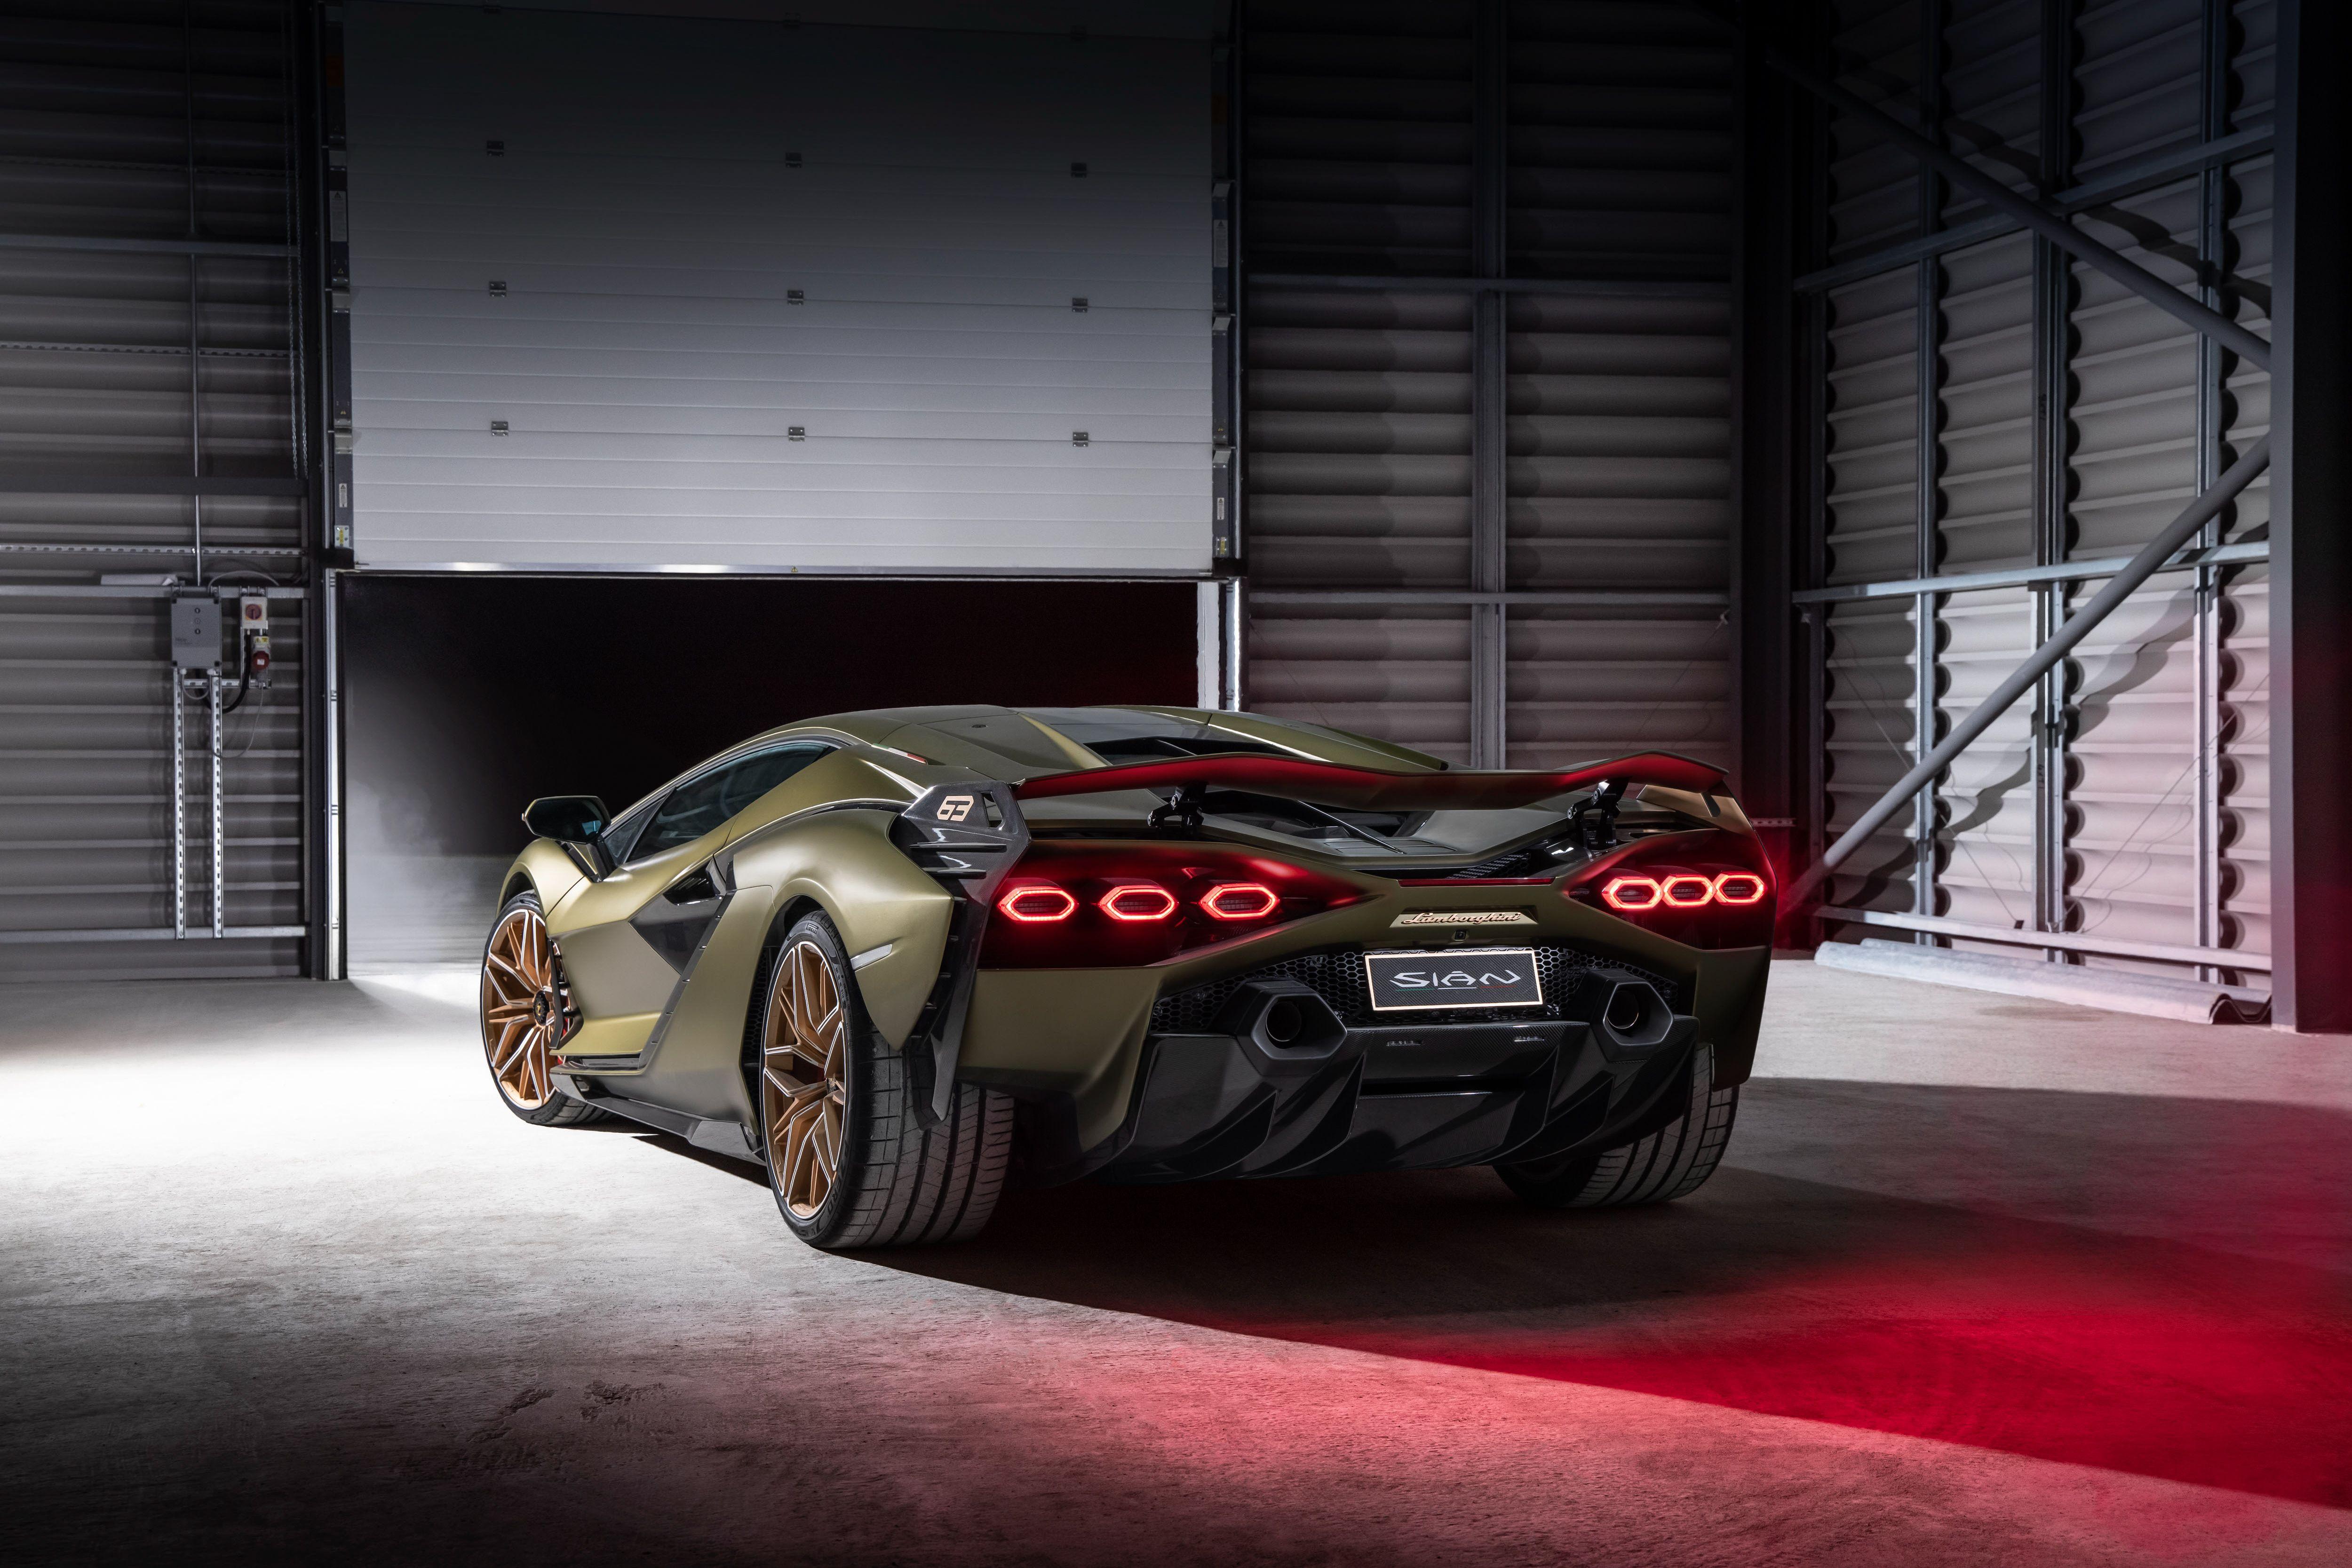 lamborghini sian 2021 rear 4k 1618920700 - Lamborghini Sian 2021 Rear 4k - Lamborghini Sian 2021 Rear 4k wallpapers